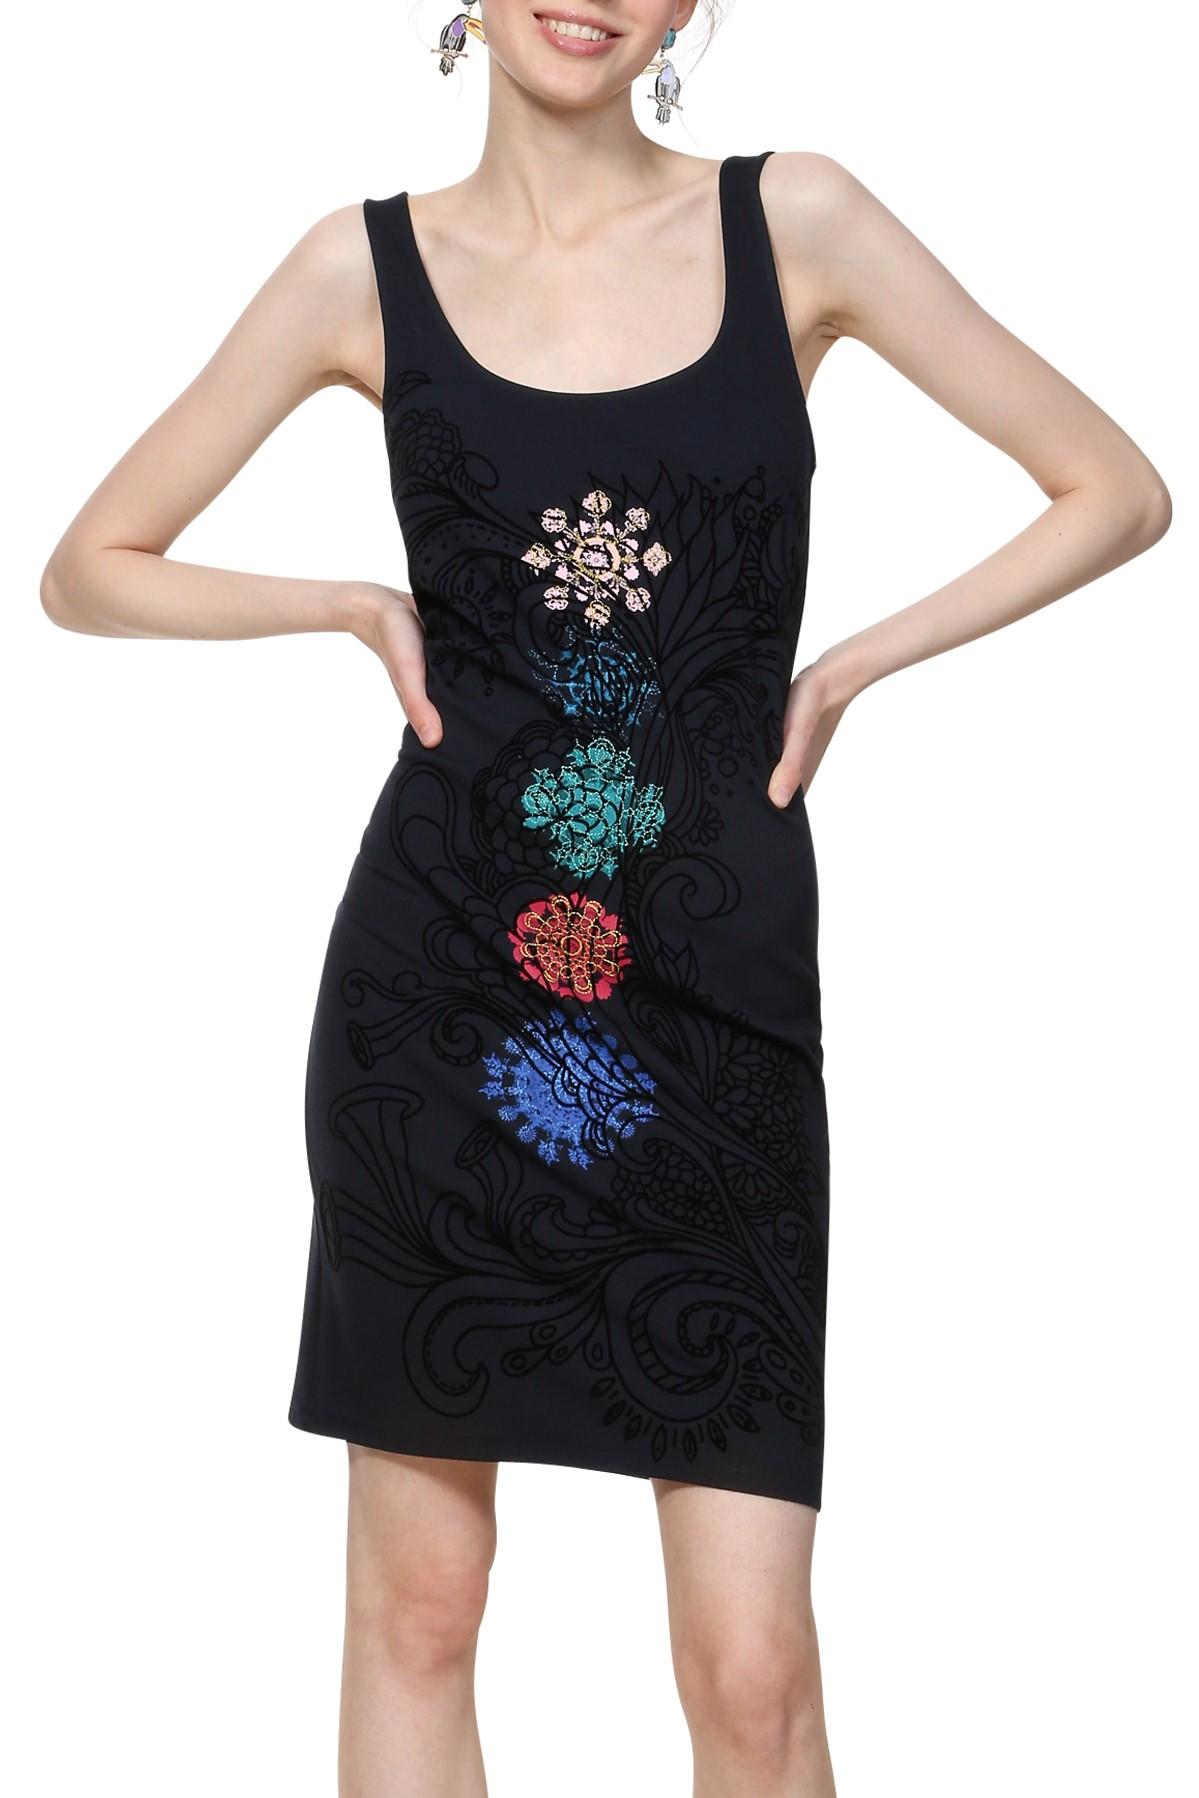 da4ed7685c2d Desigual temne modré šaty Vest Coque s mandalami - Glami.sk